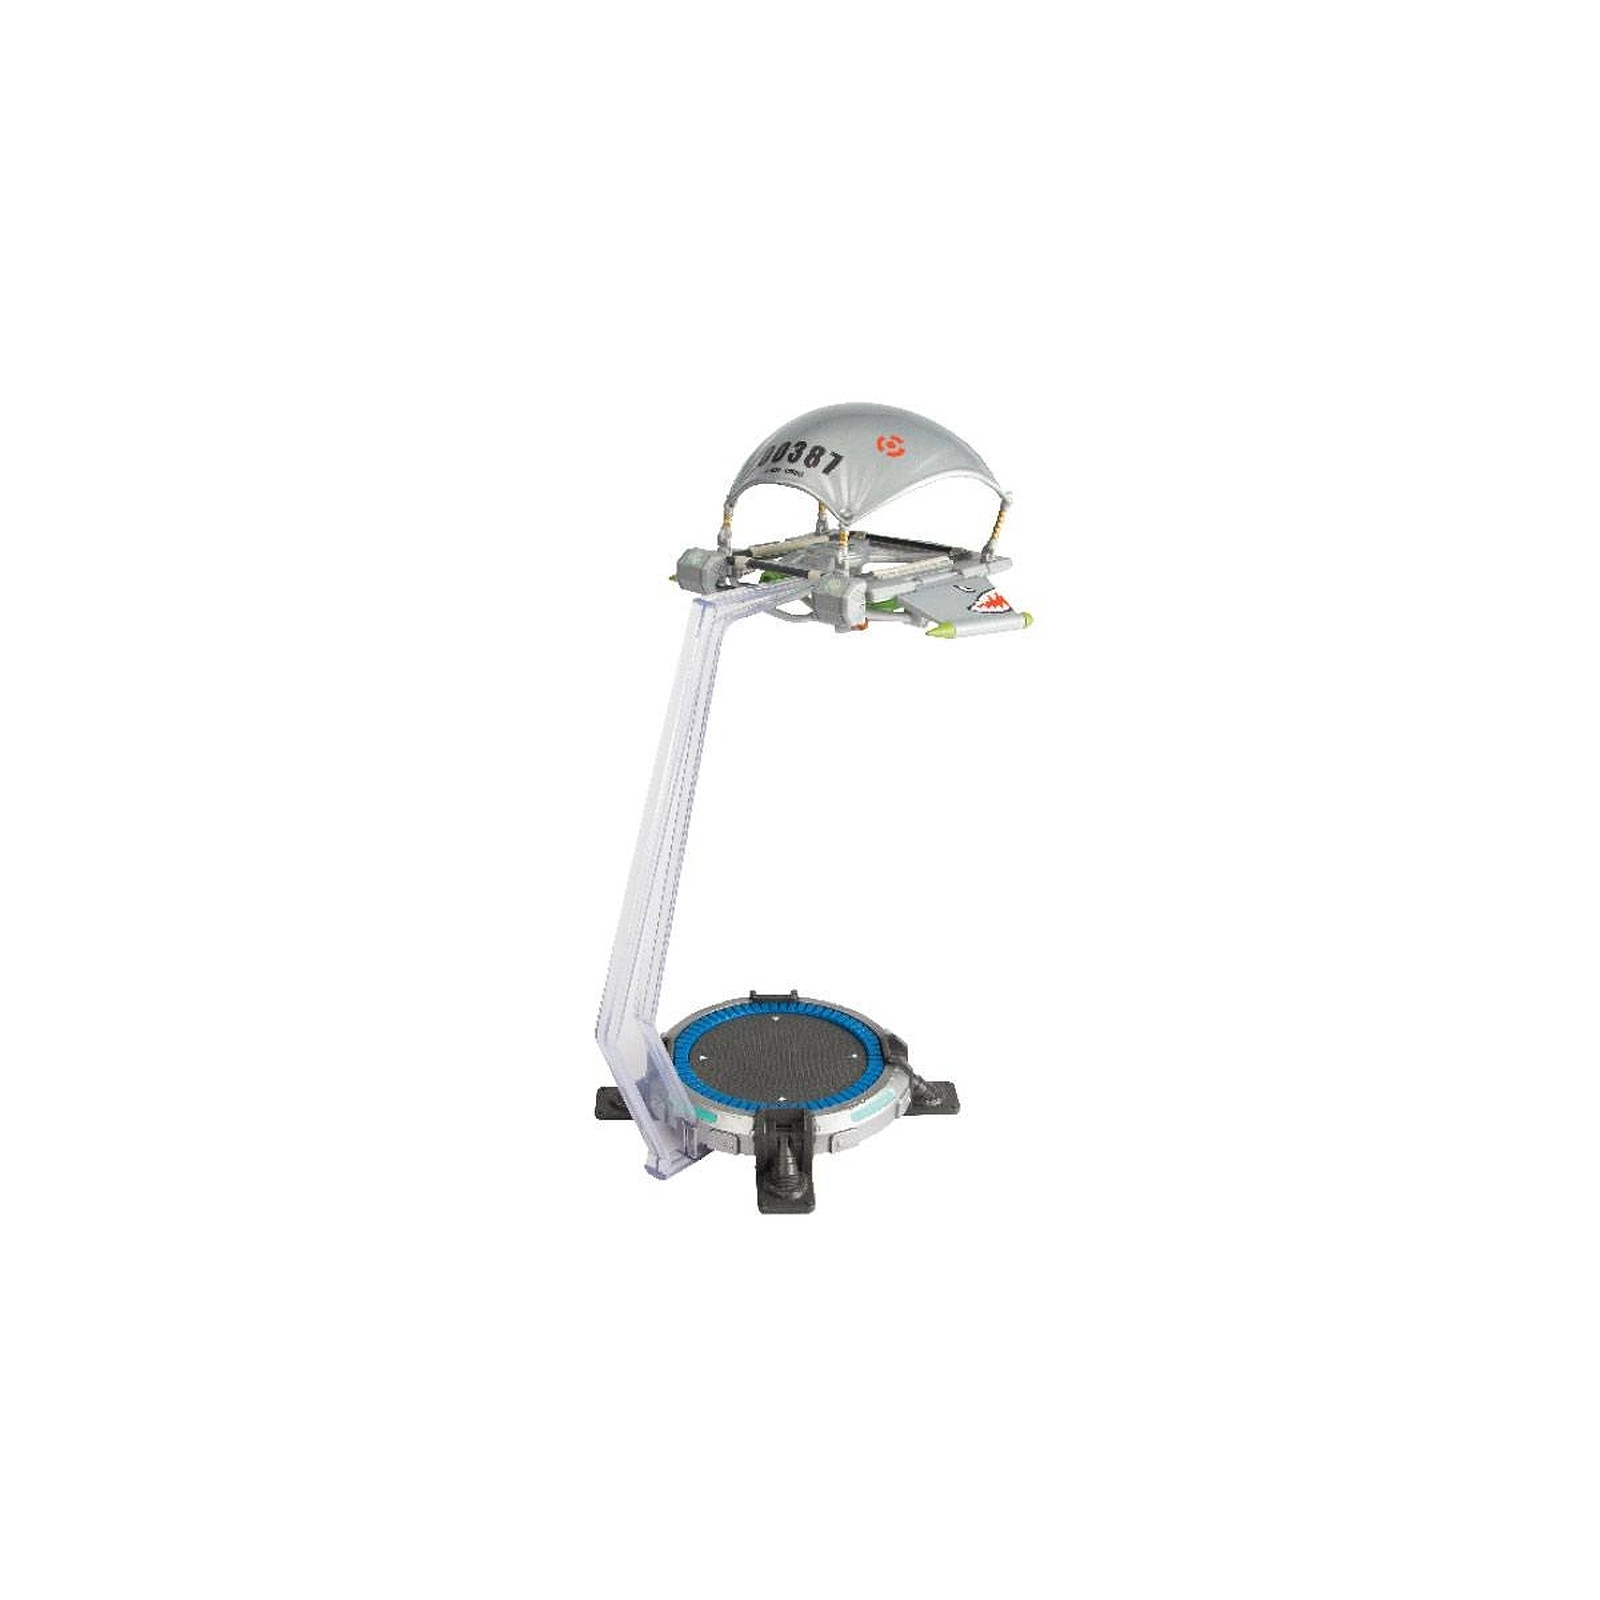 Fortnite - Accessoires pour figurines Mako Glider Pack 35 cm